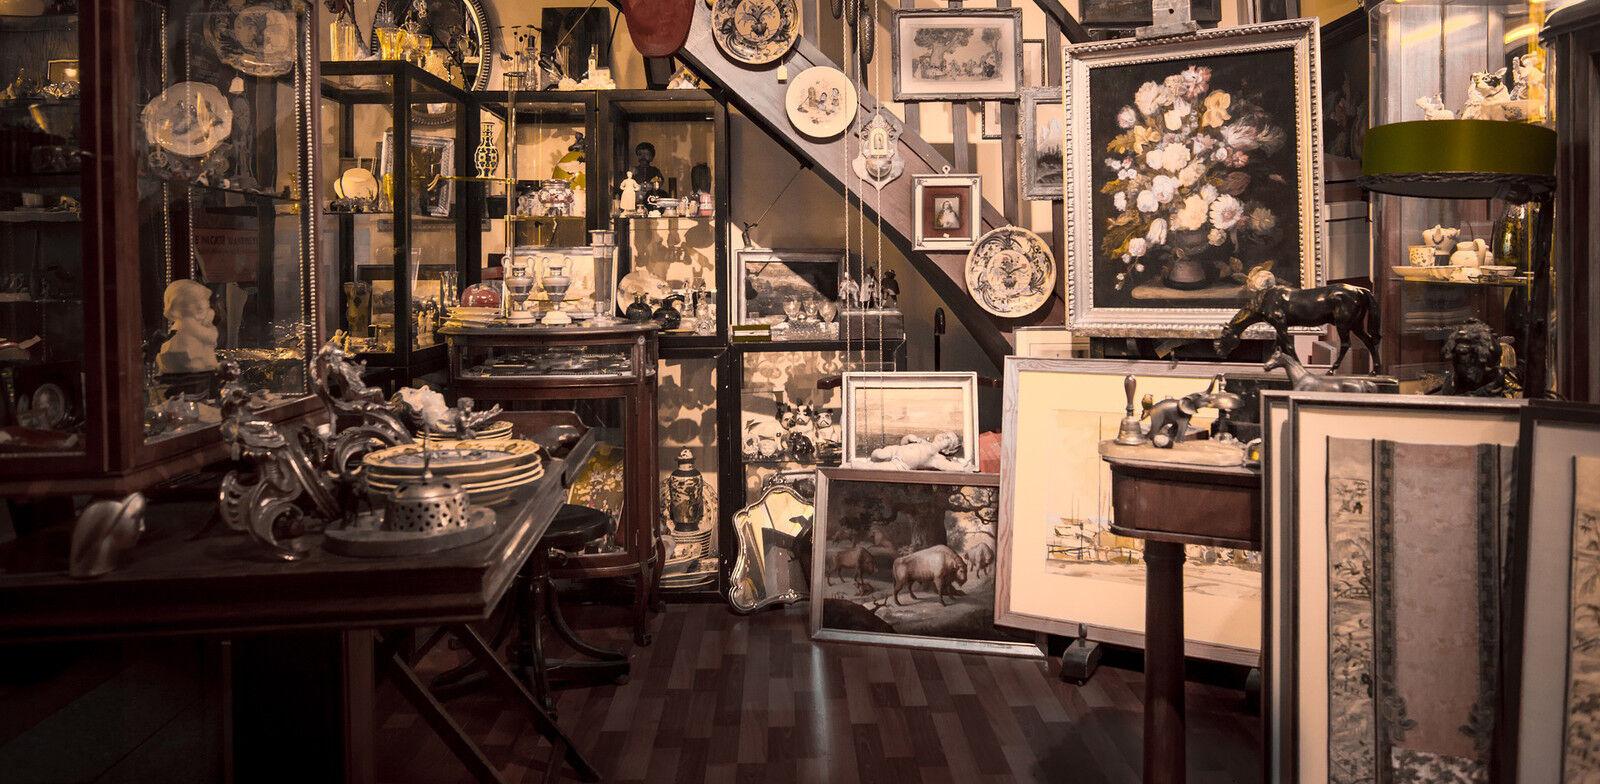 Across the Counter Collectibles